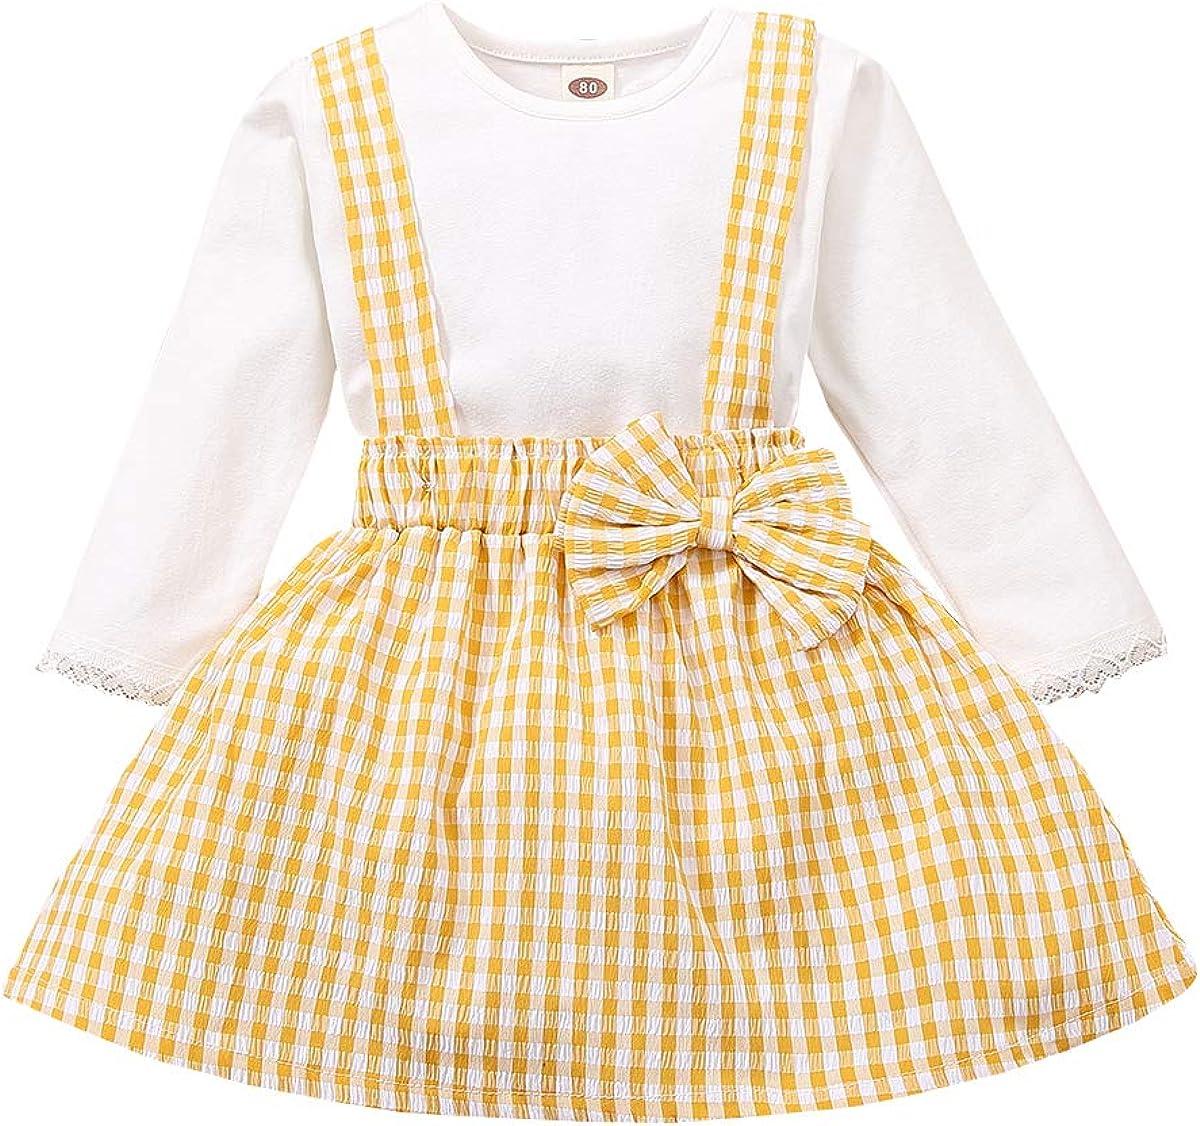 Infant Toddler Baby Girl Suspender Skirt Set Cotton Solid T ShirtsPlaid Overall Skirts Set Baby Girl Skirt Clothes Set